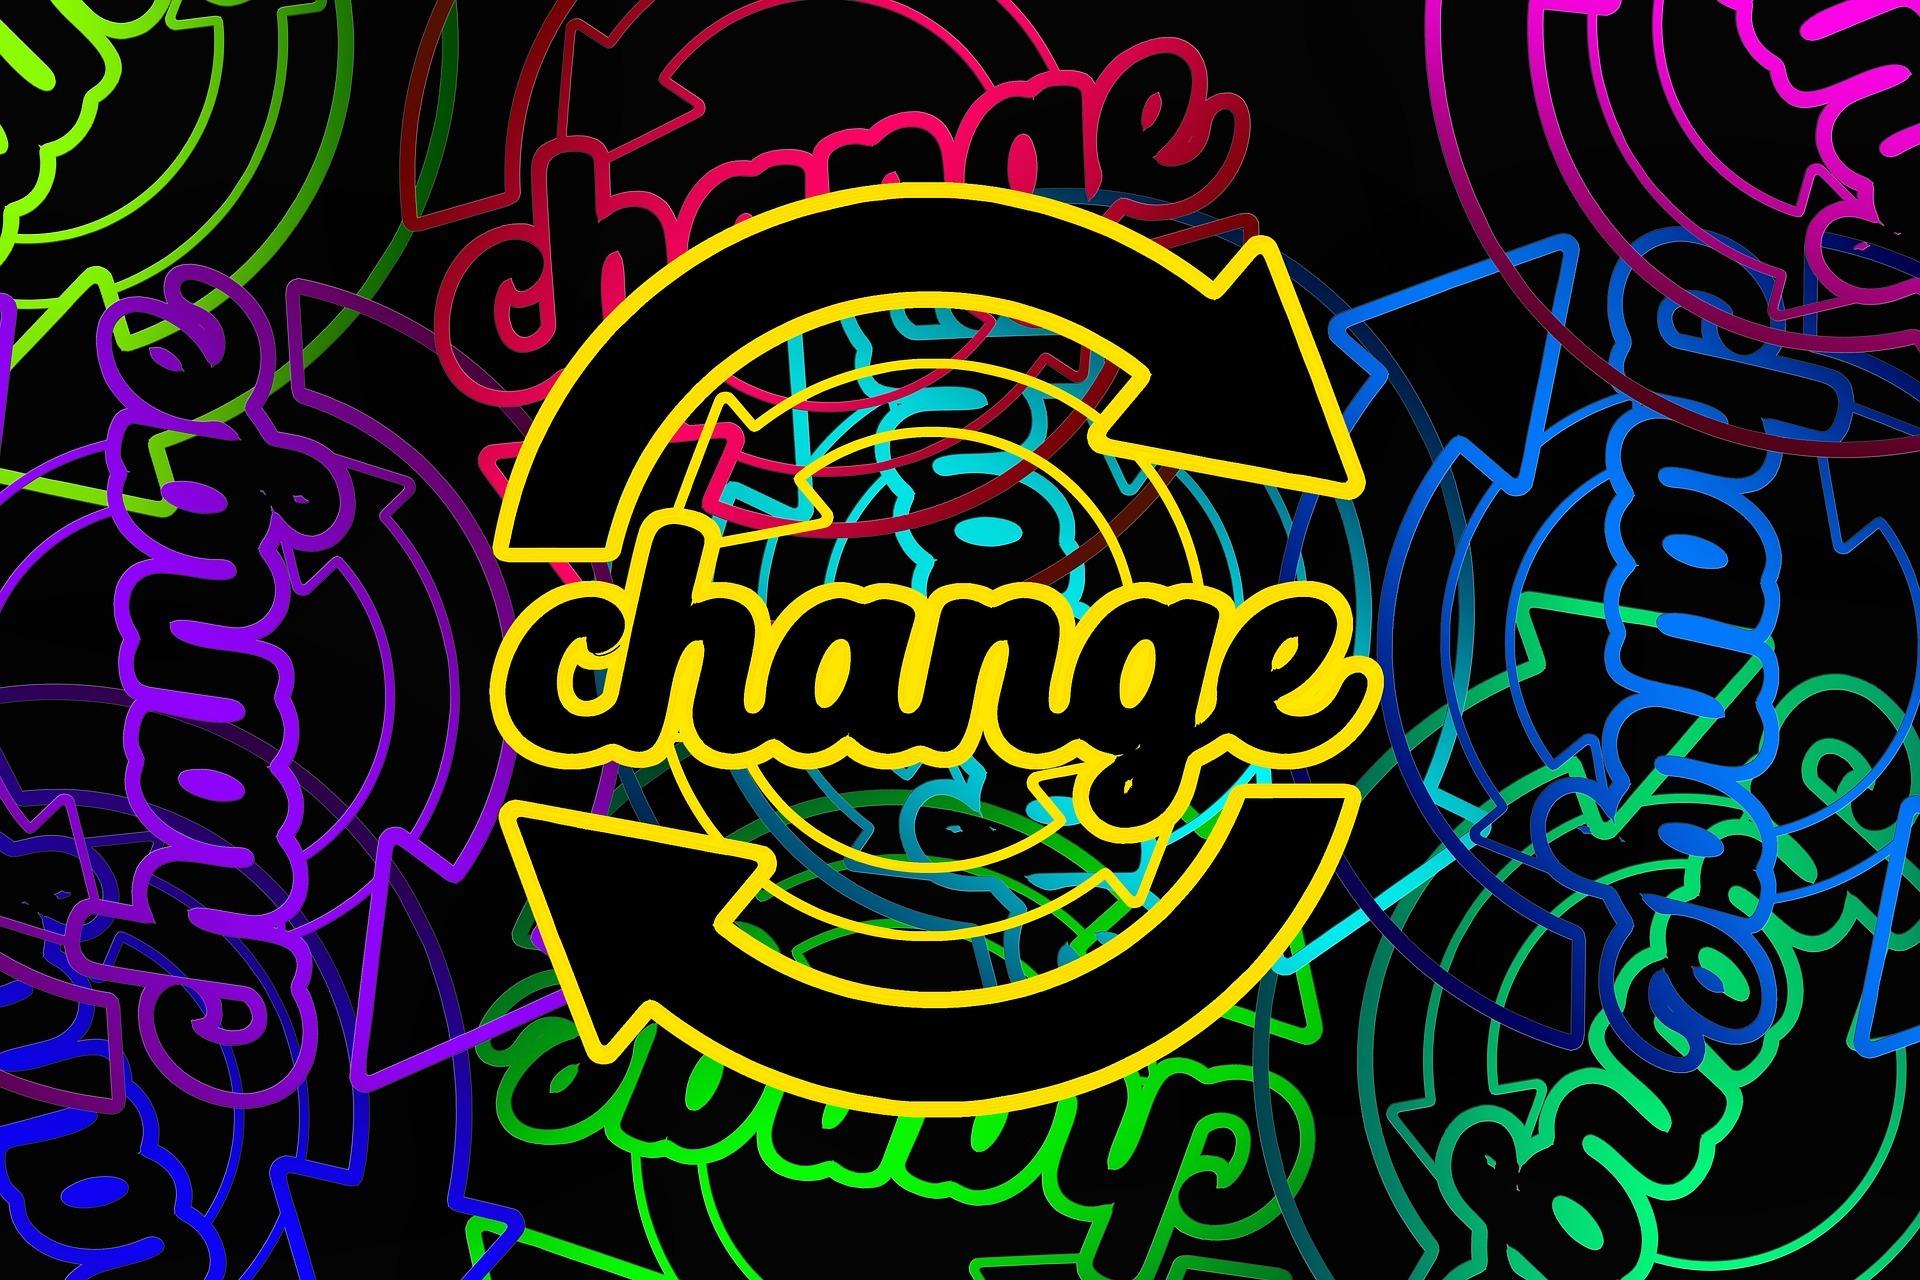 change-2696395_1920.jpg